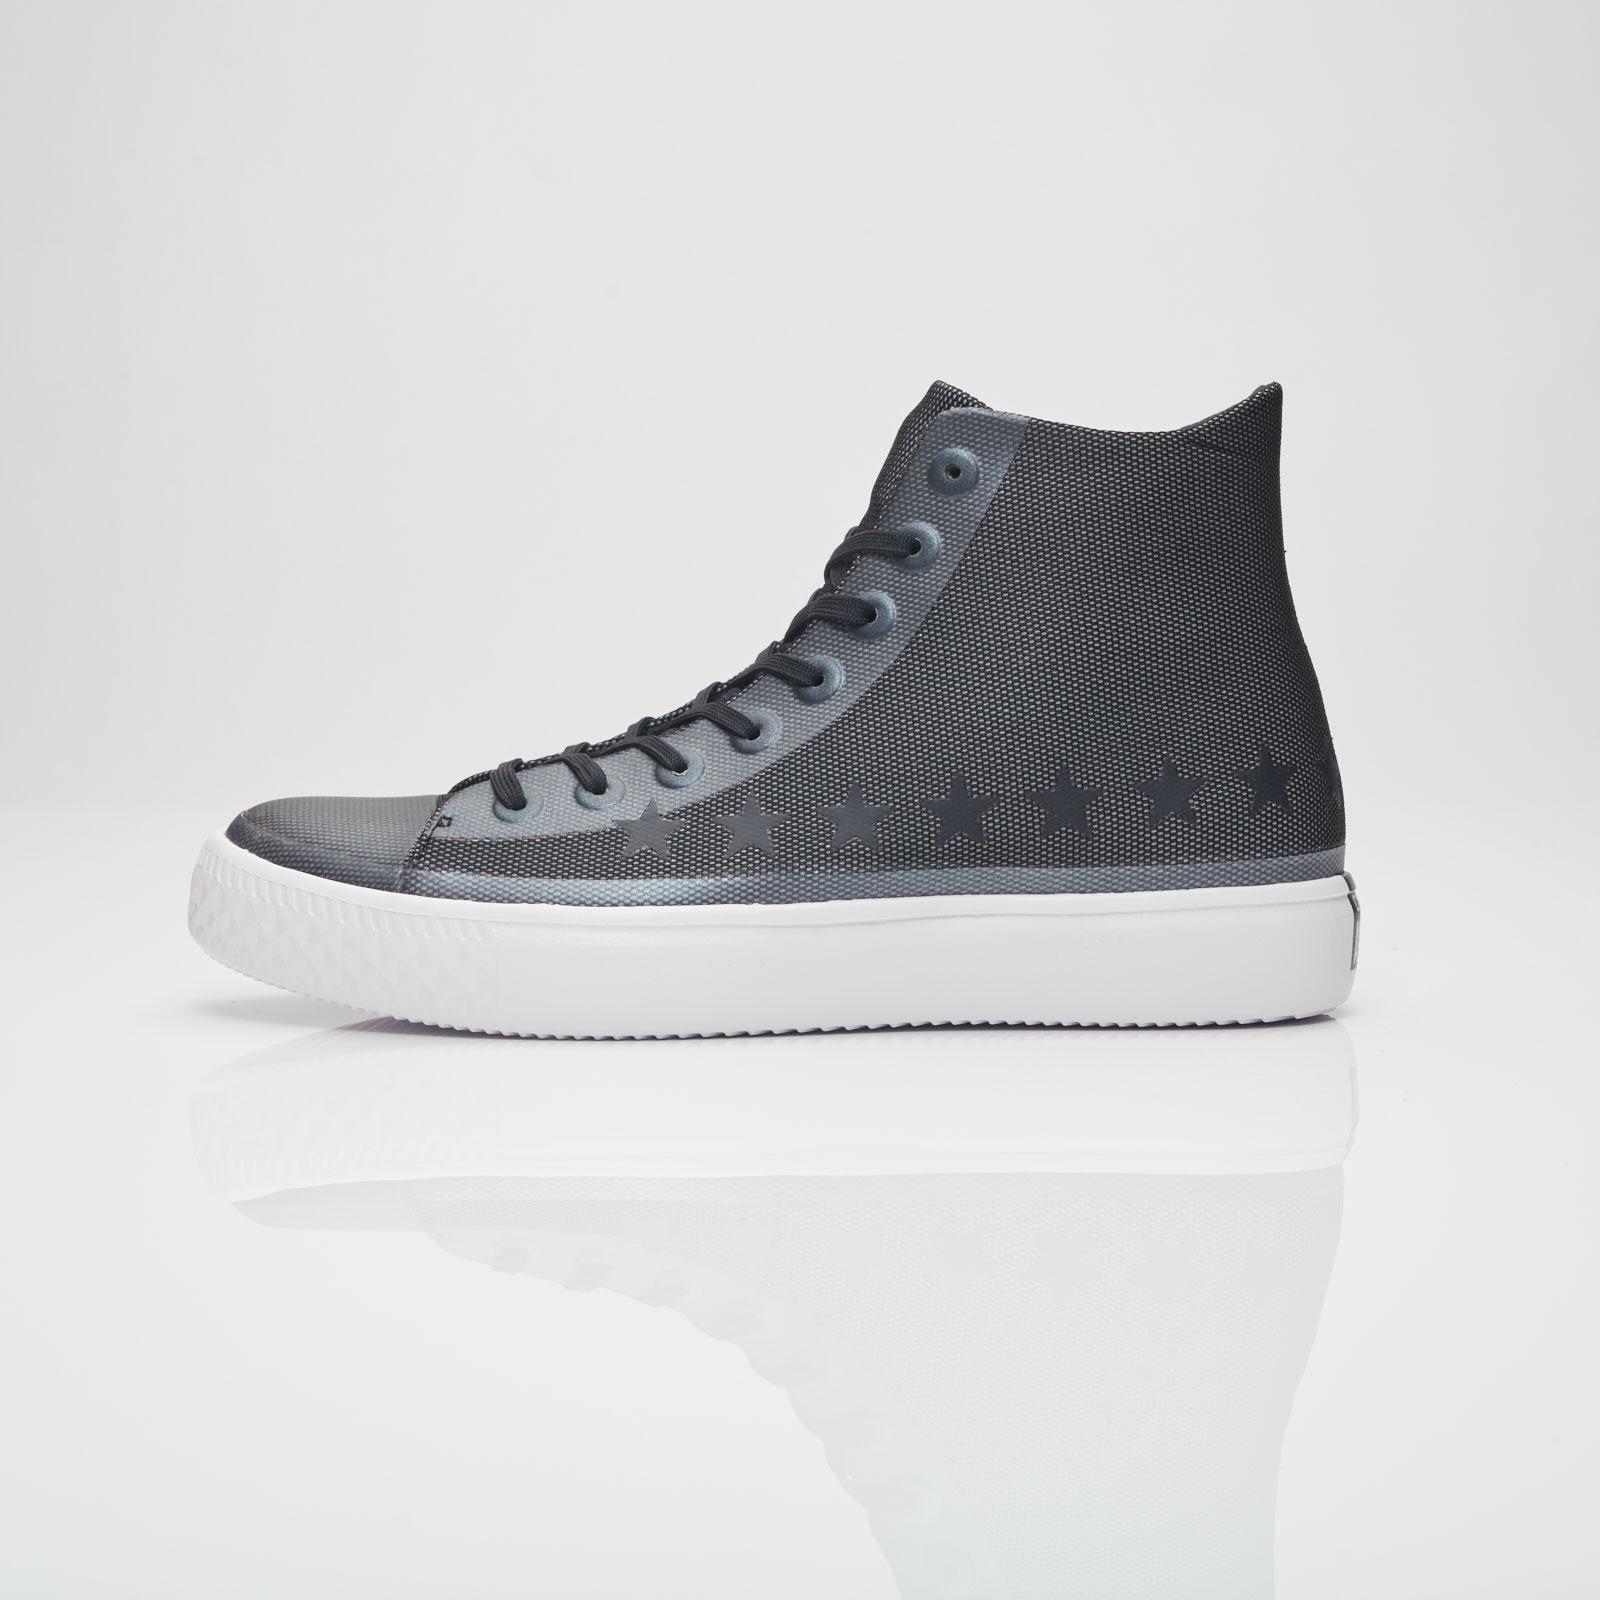 bb8b533d18e2 Converse Chuck Taylor All Star Modern Lux Hi - 156639c - Sneakersnstuff